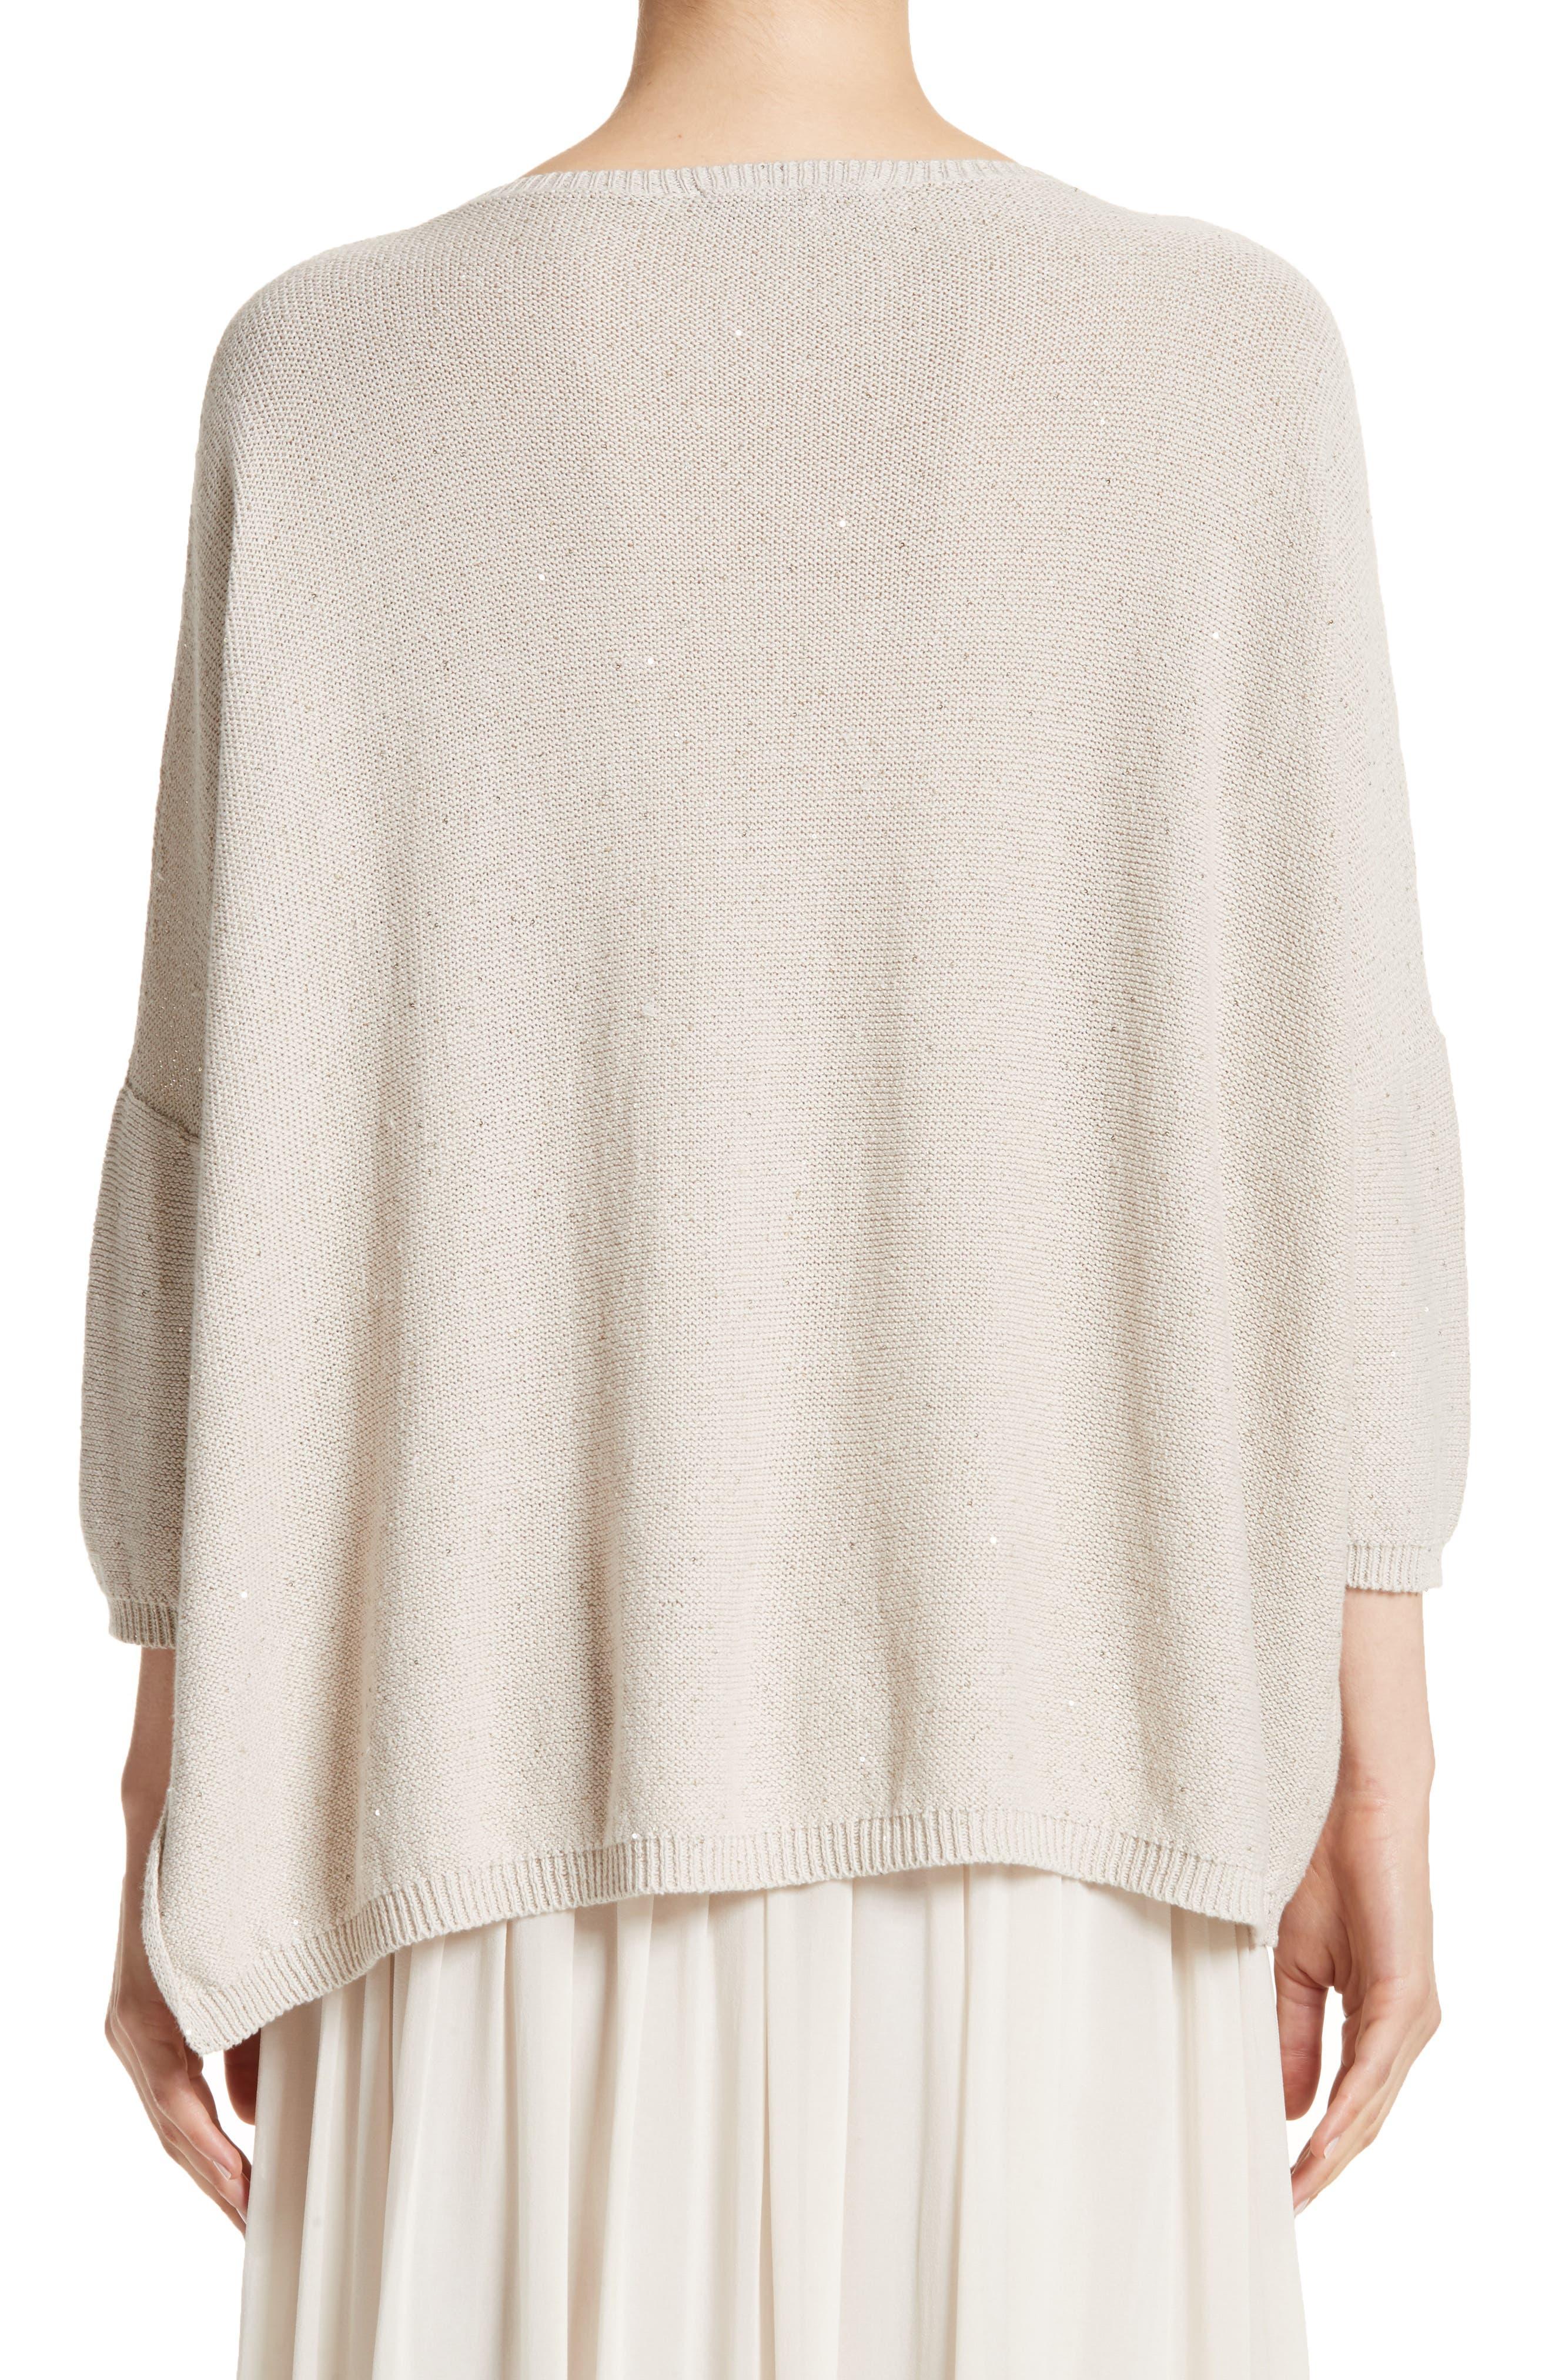 Sequin Knit Dolman Sweater,                             Alternate thumbnail 2, color,